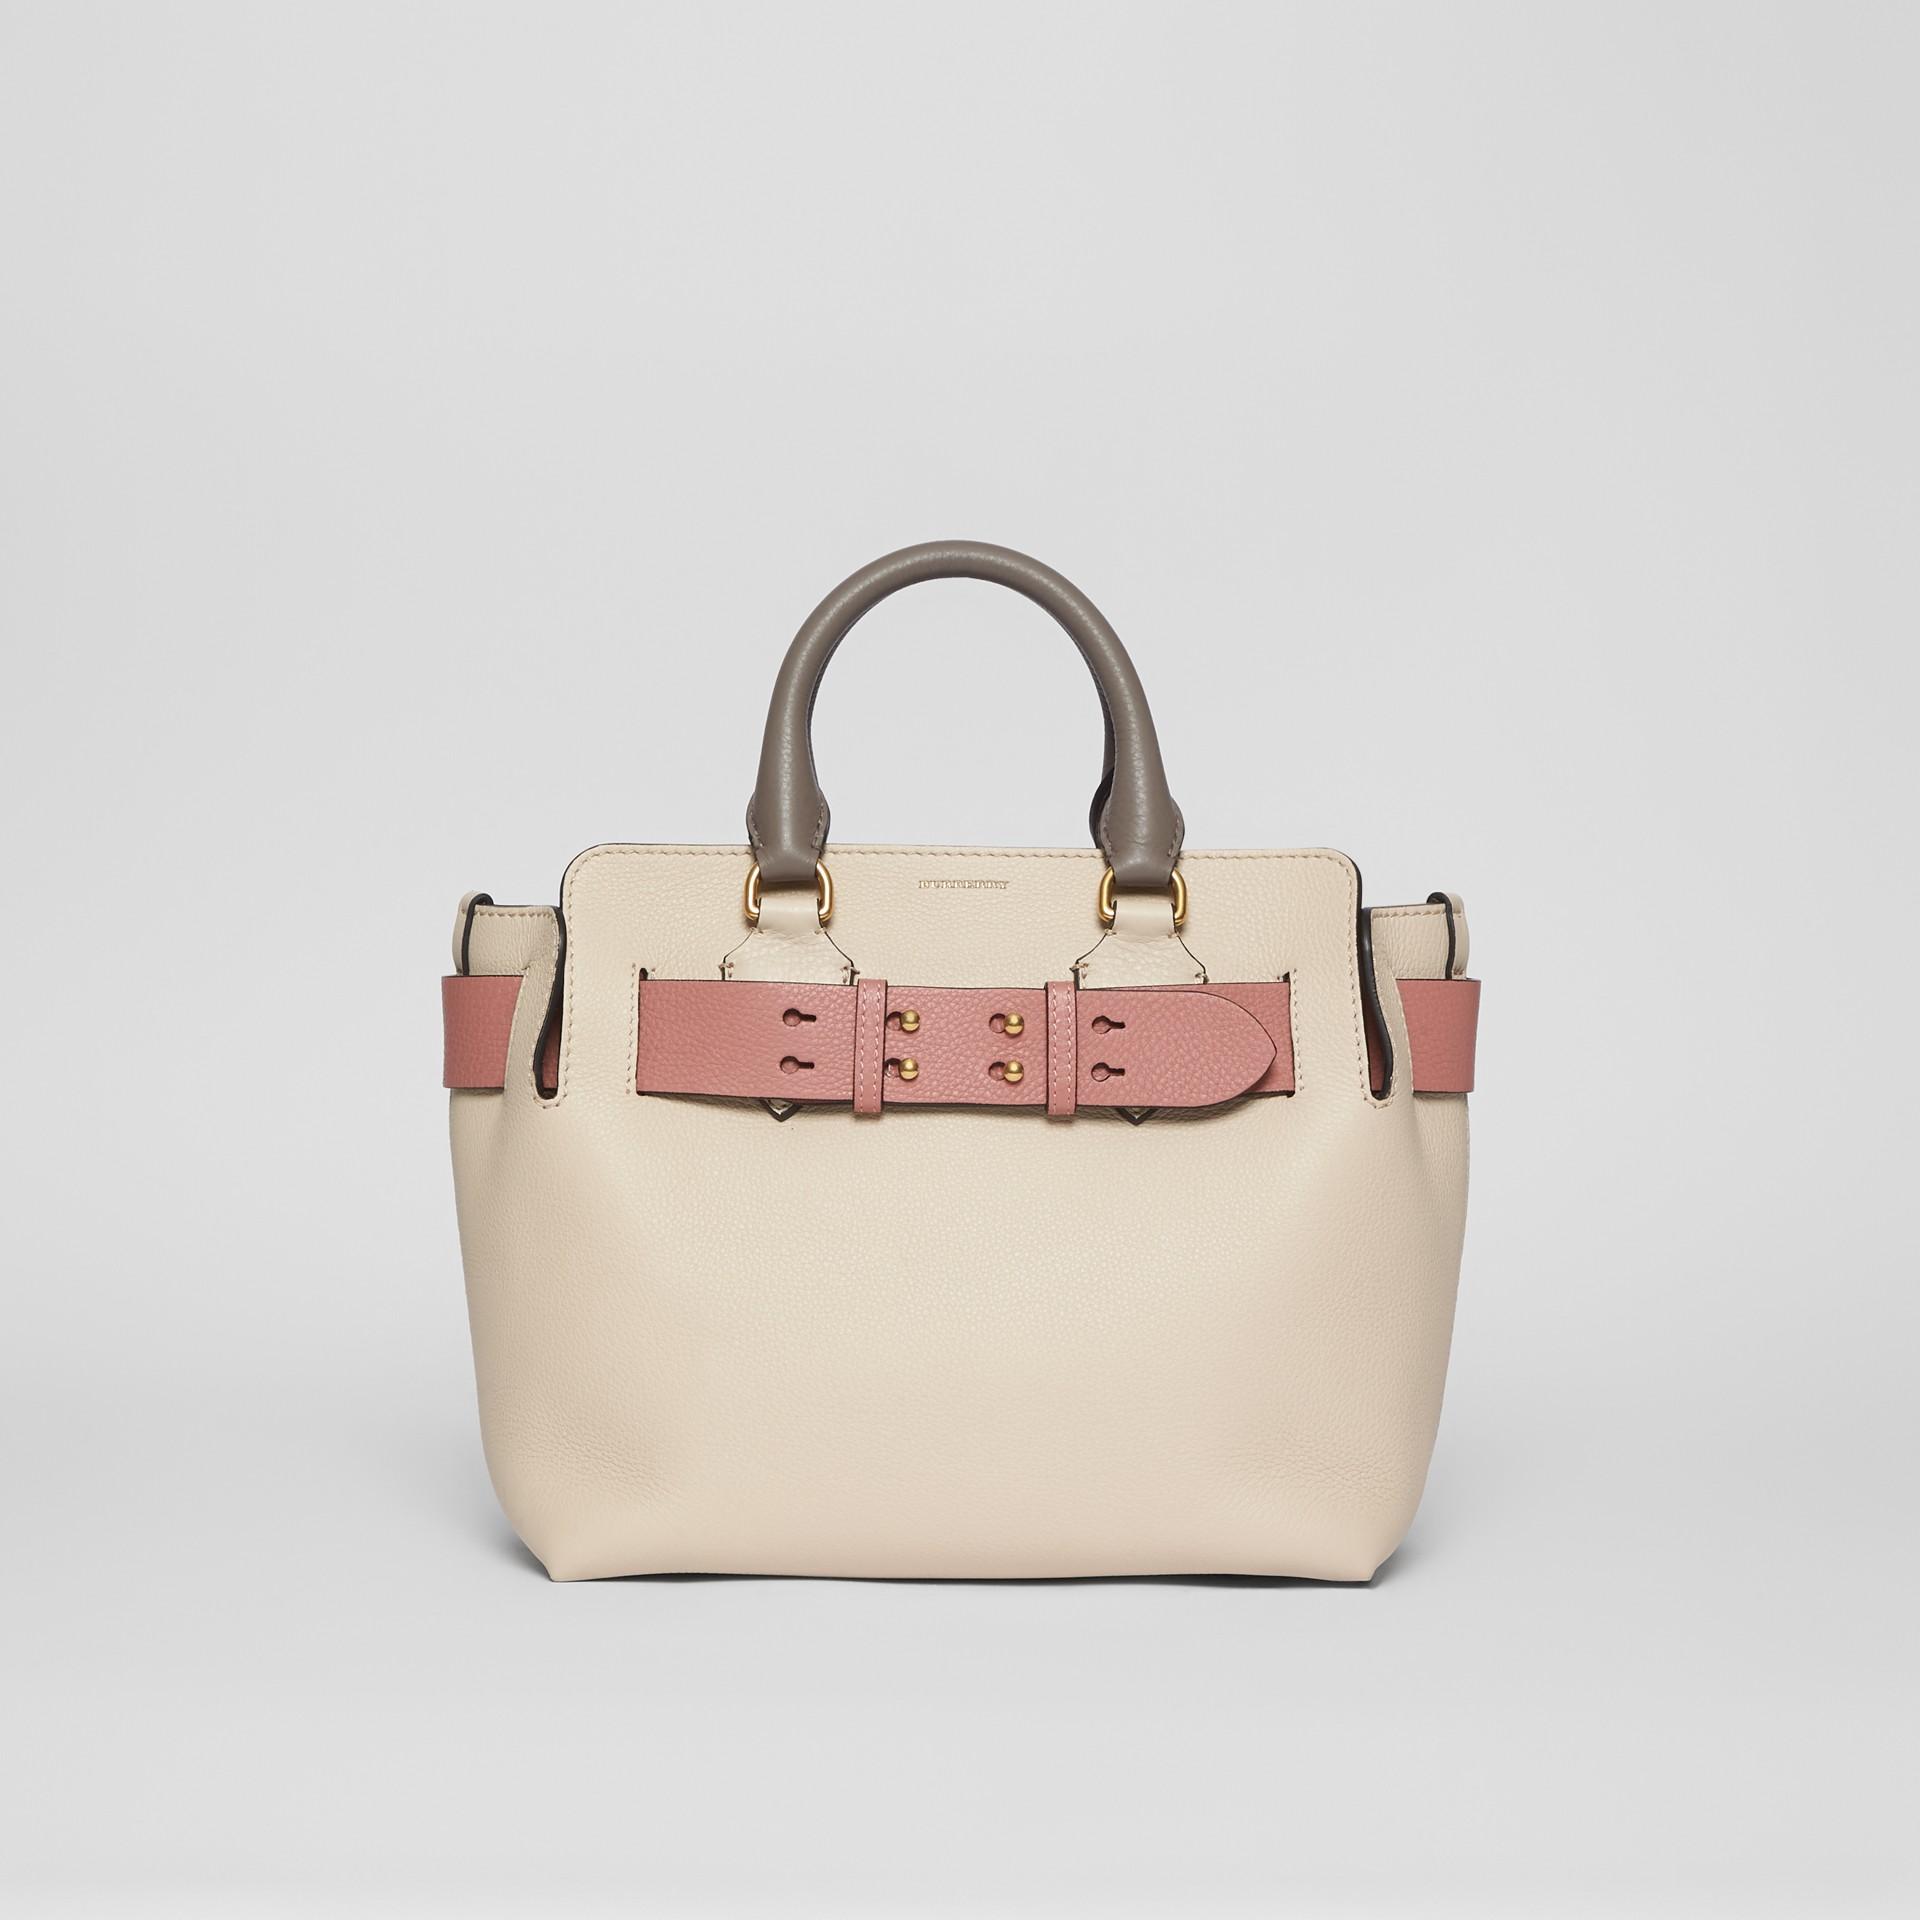 The Small Belt Bag aus Leder in Dreitonoptik (Kalksteinfarben/altrosenfarben) - Damen | Burberry - Galerie-Bild 0